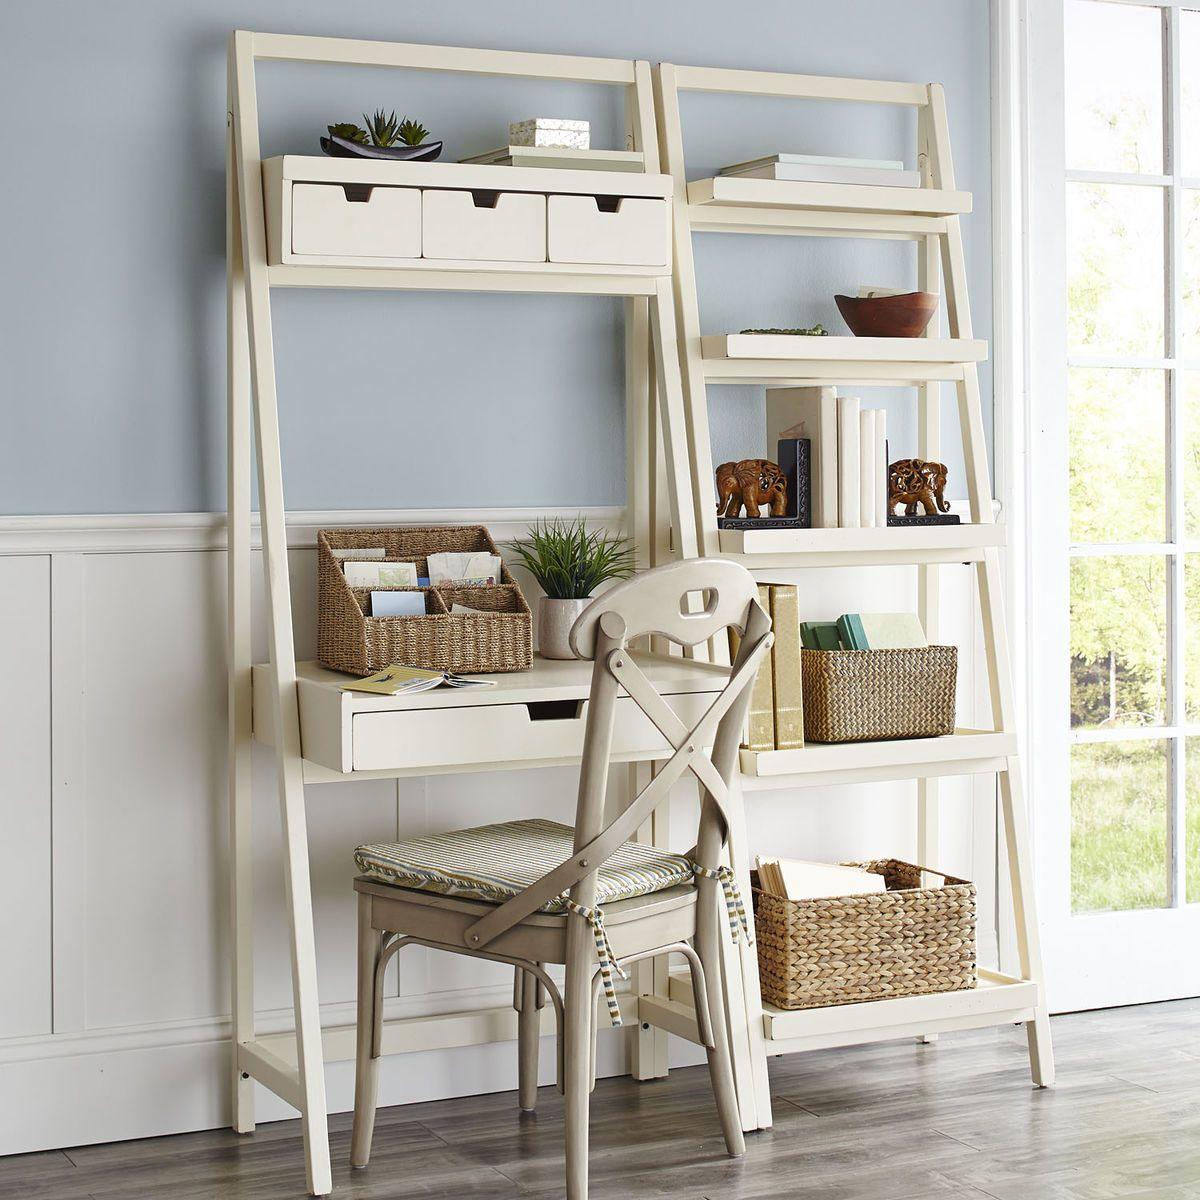 Morgan Desk Antique White Pier 1 Imports Home Decor Antique White Desk Home Office Furniture